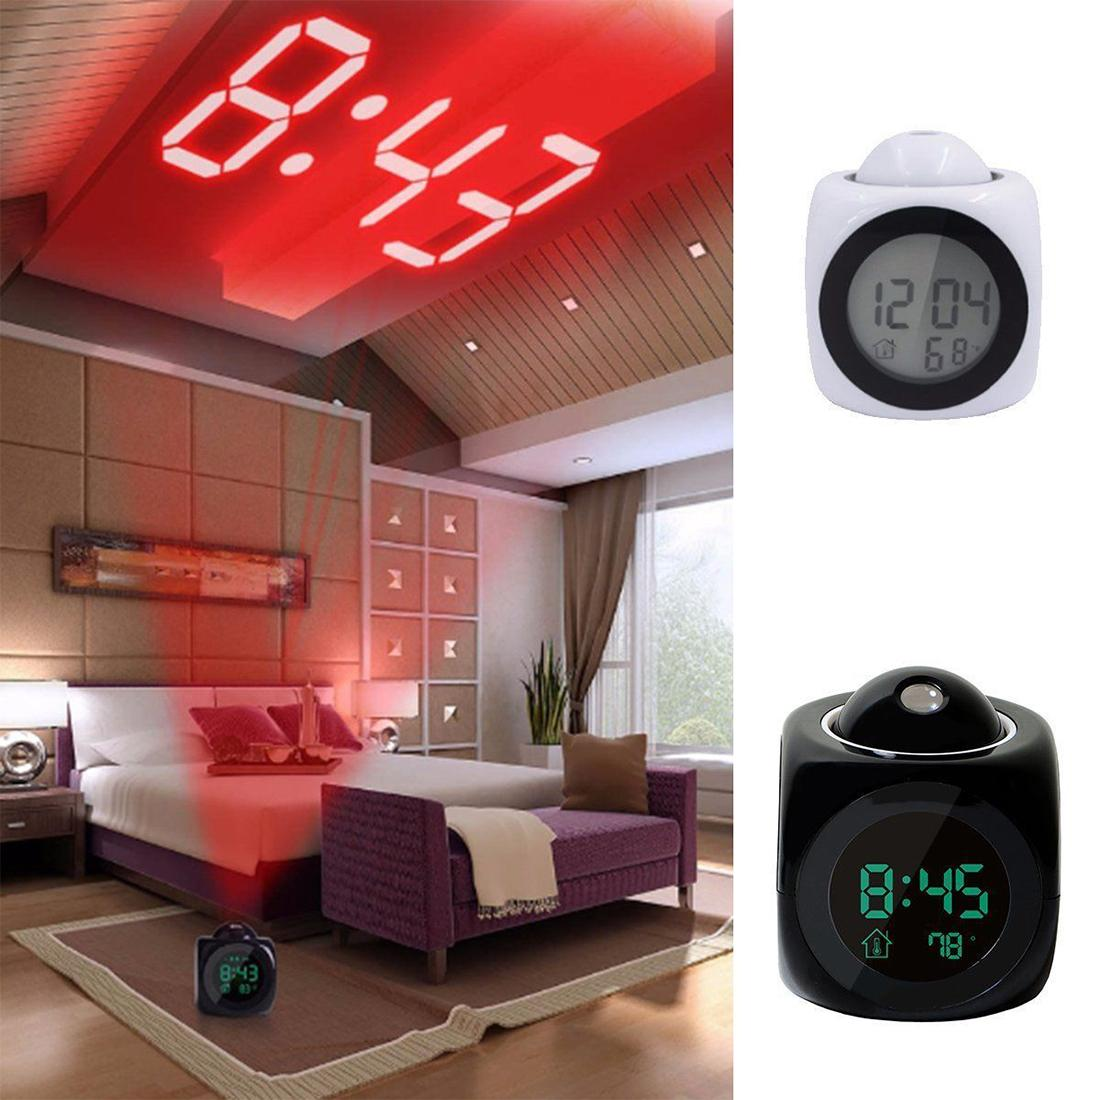 Colorful LED Display Modern Projection Led Clock Orologio elettronico da tavolo digitale Orologio da tavolo Snooze Function Cables